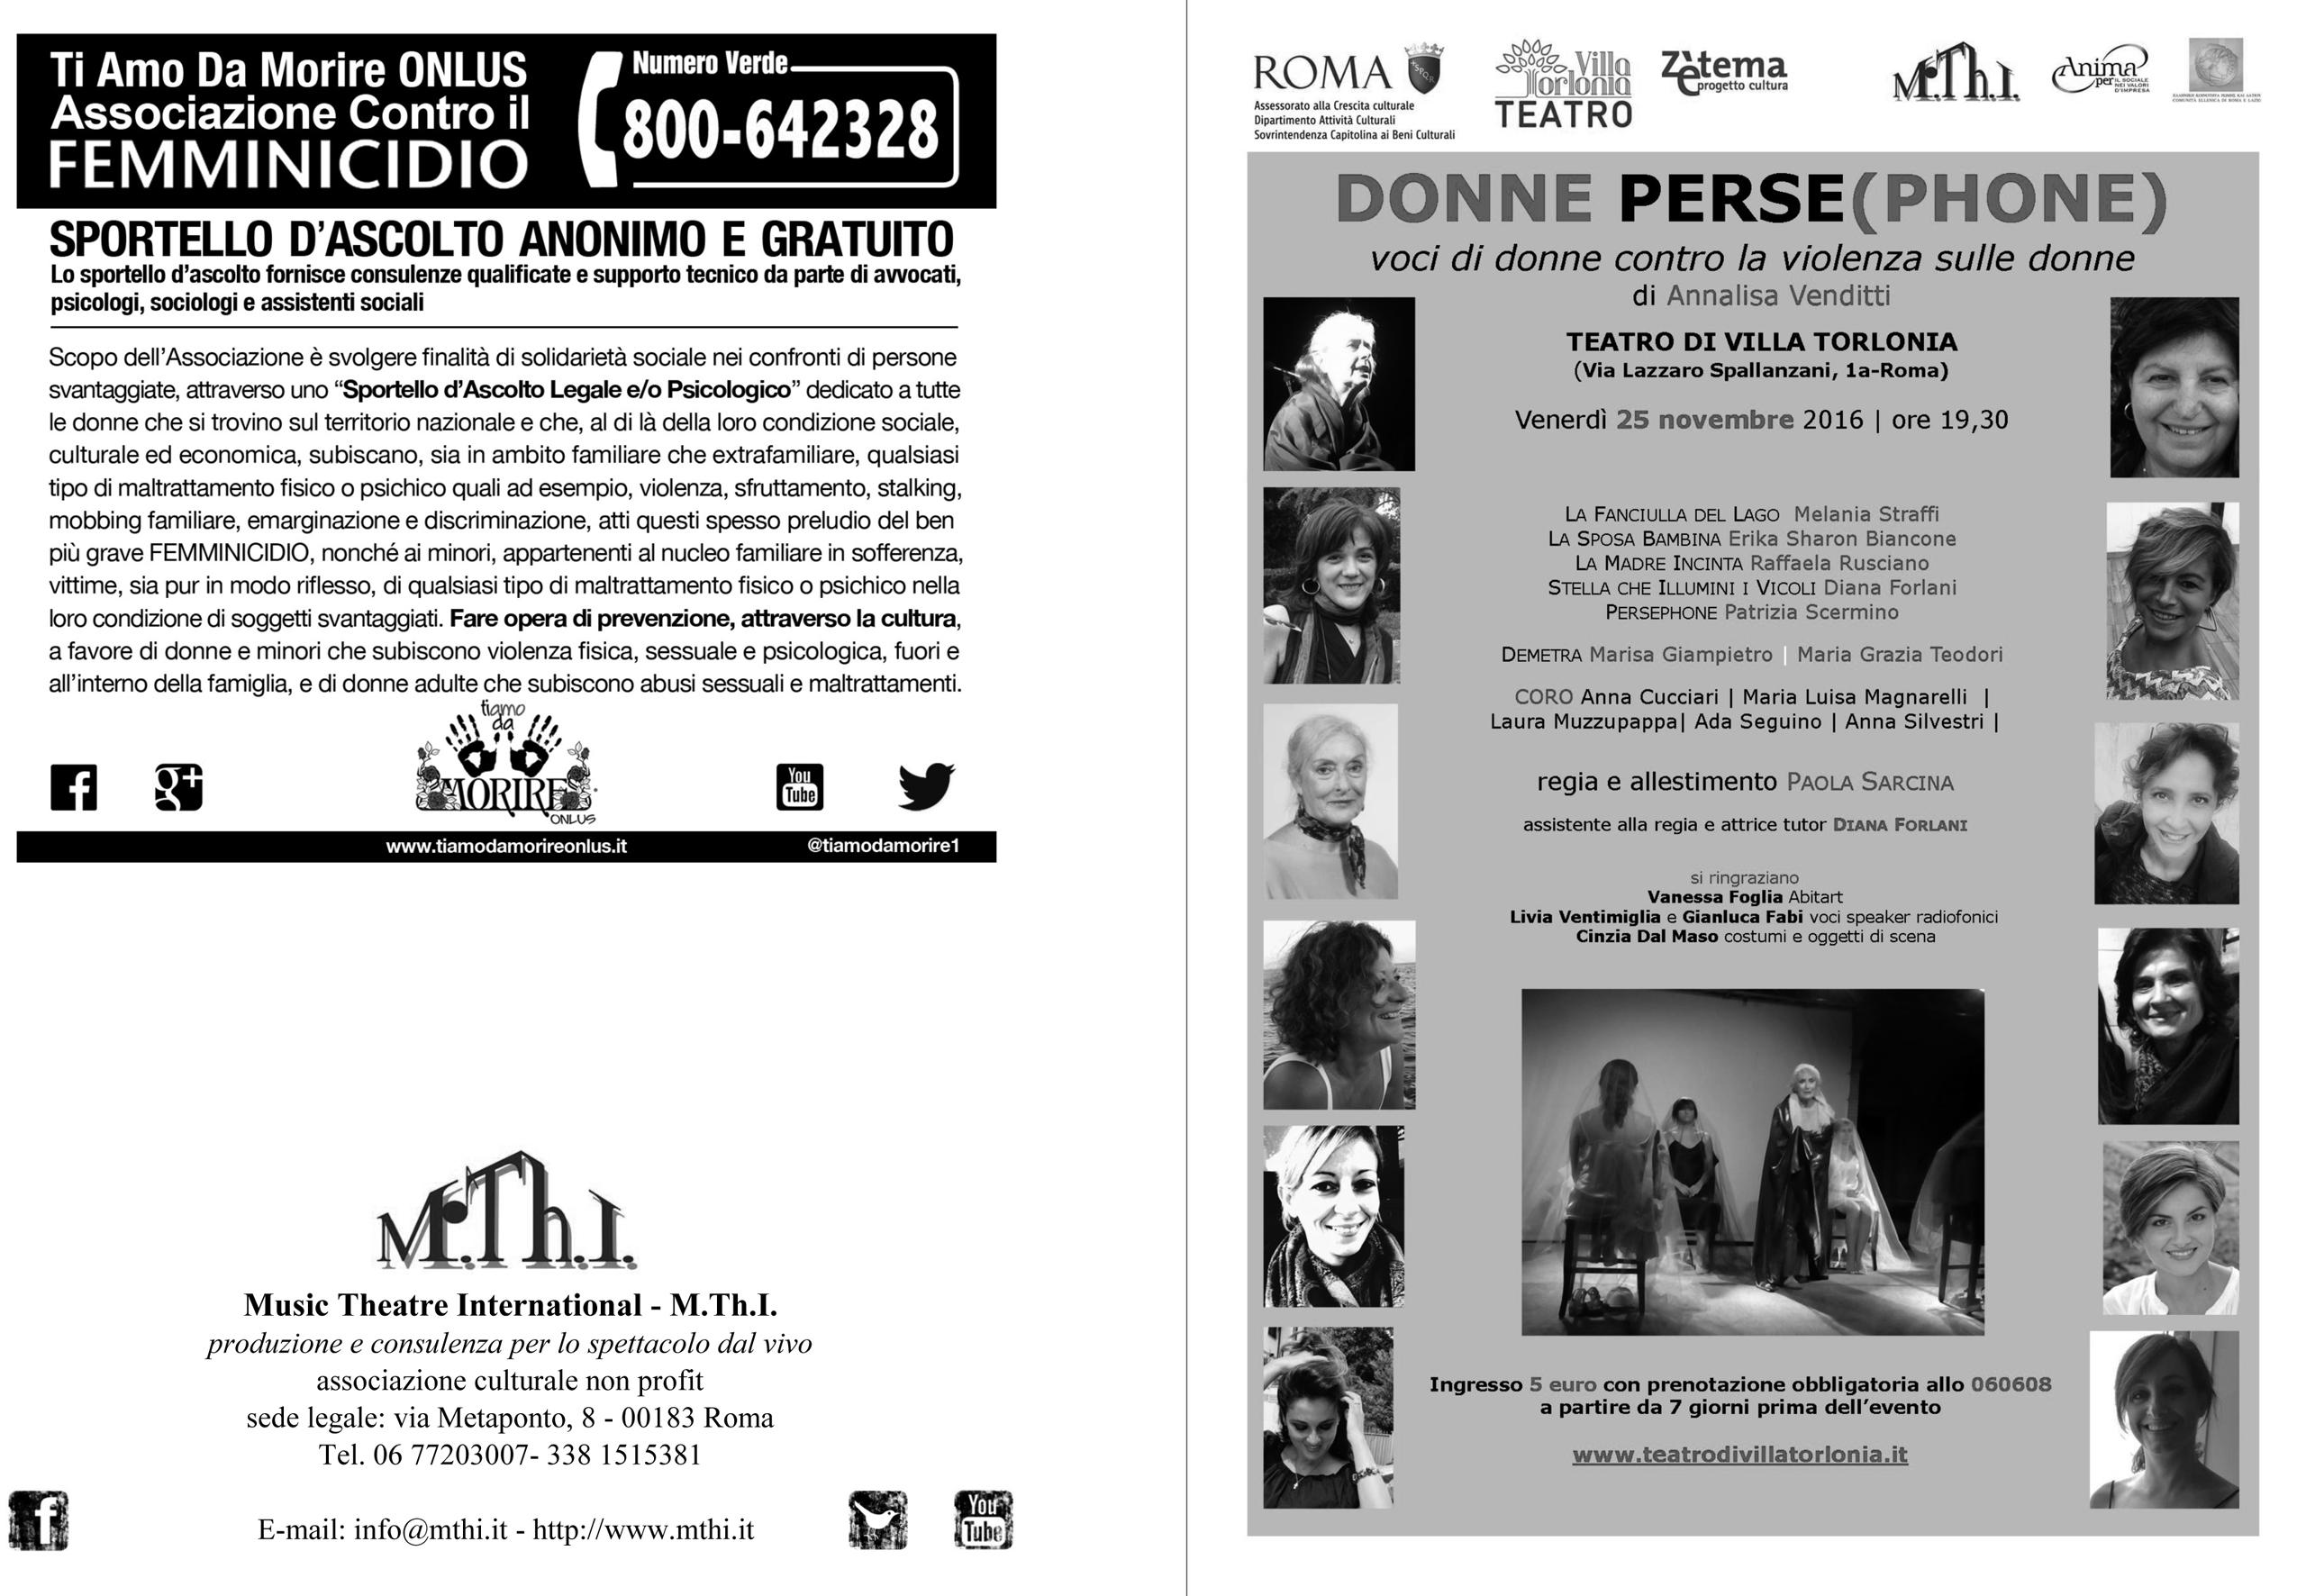 programma-sala-donne-persephone-25-nov-16-1